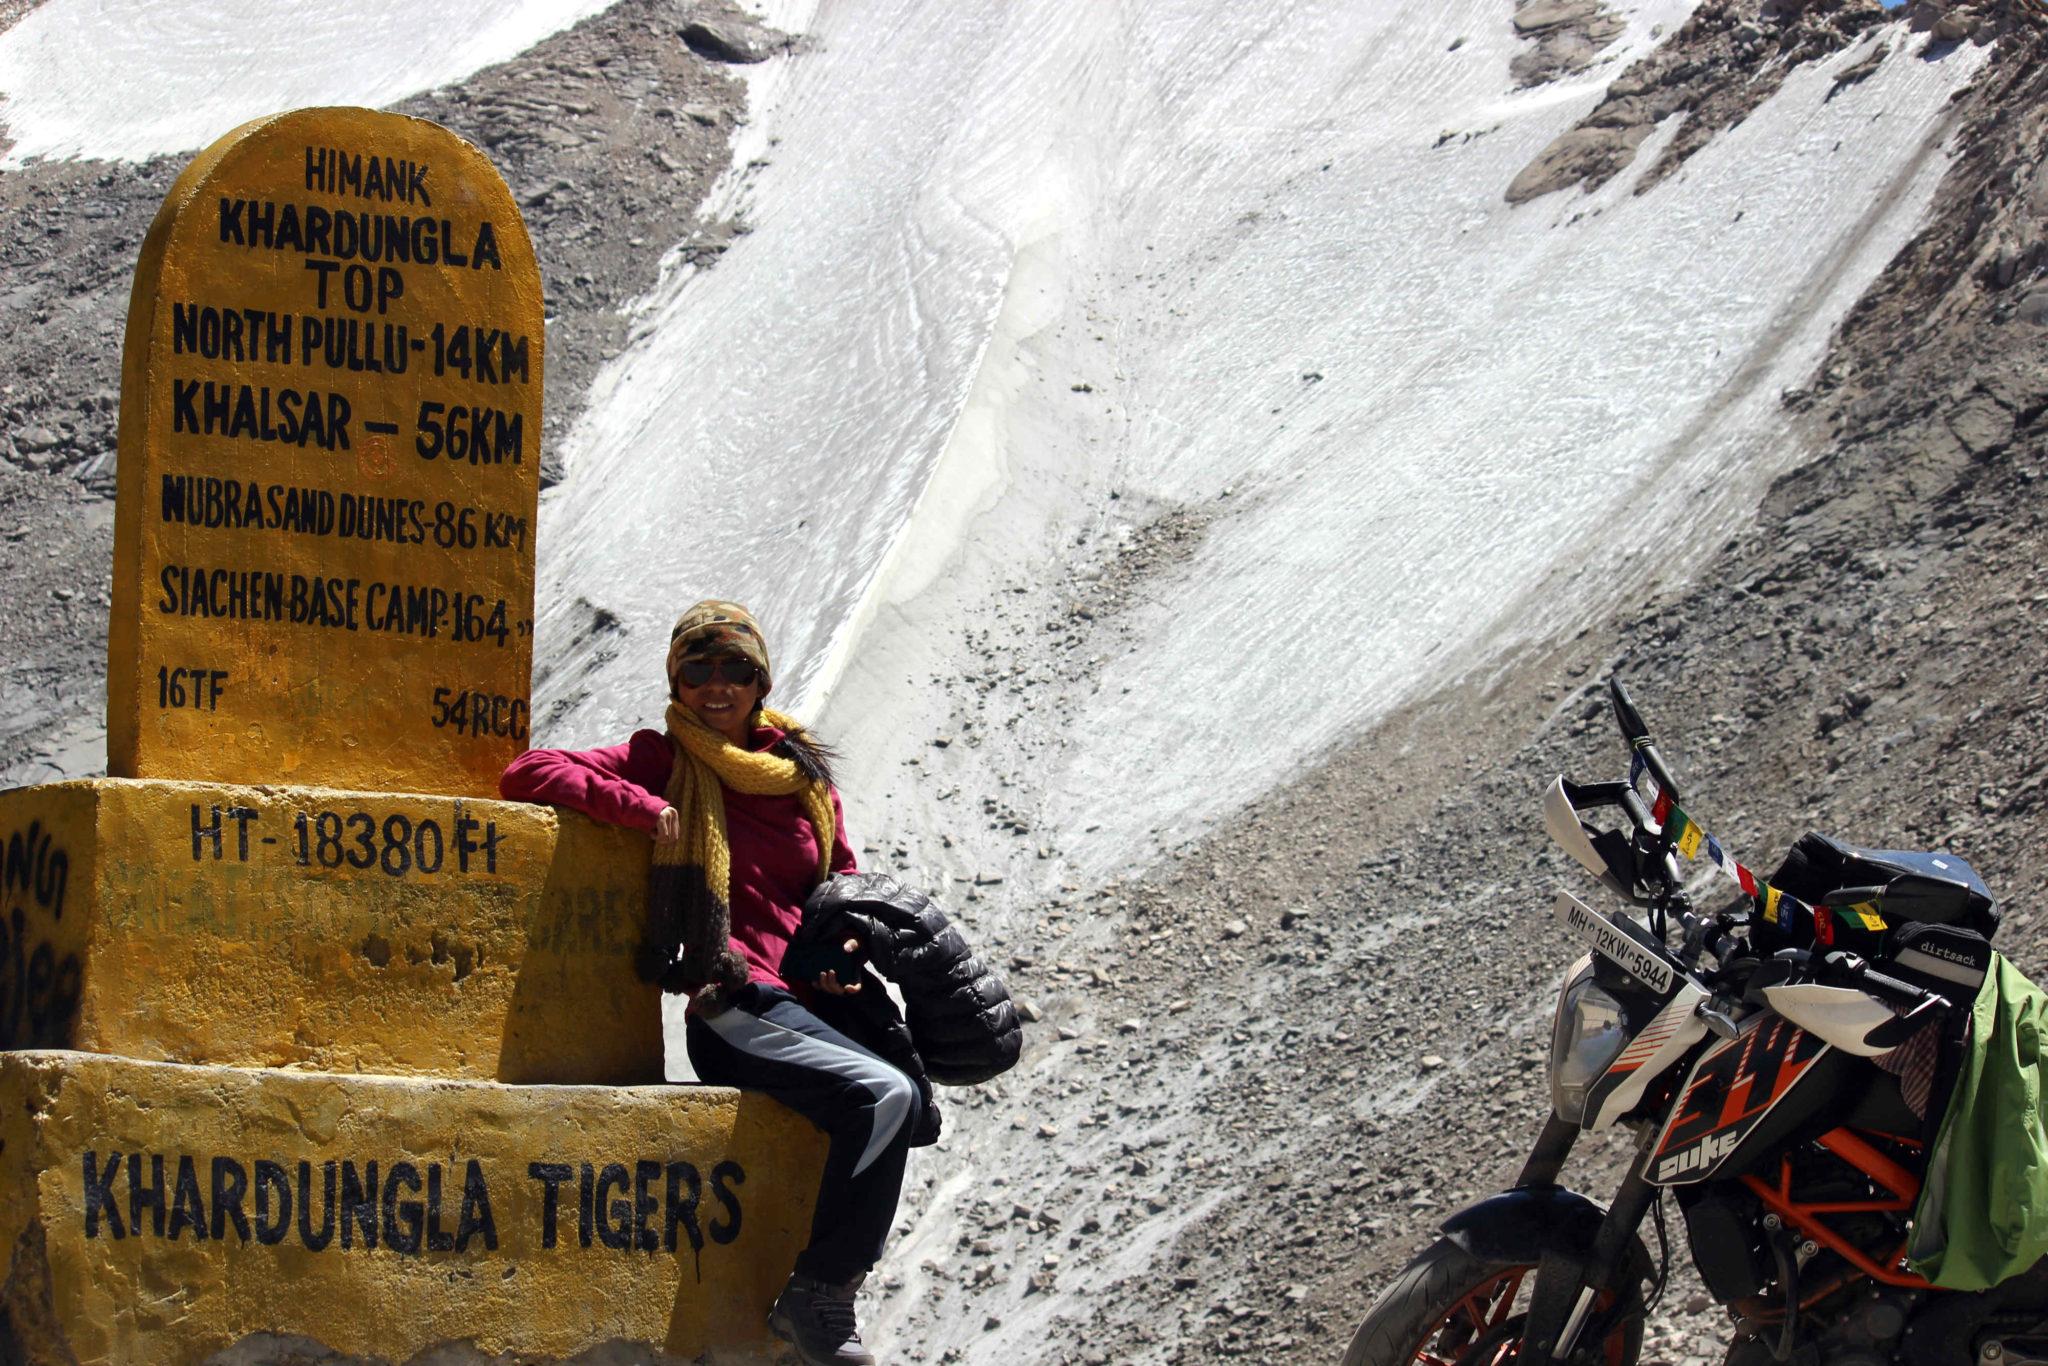 Top things to see in Leh Ladakh: Khardungla